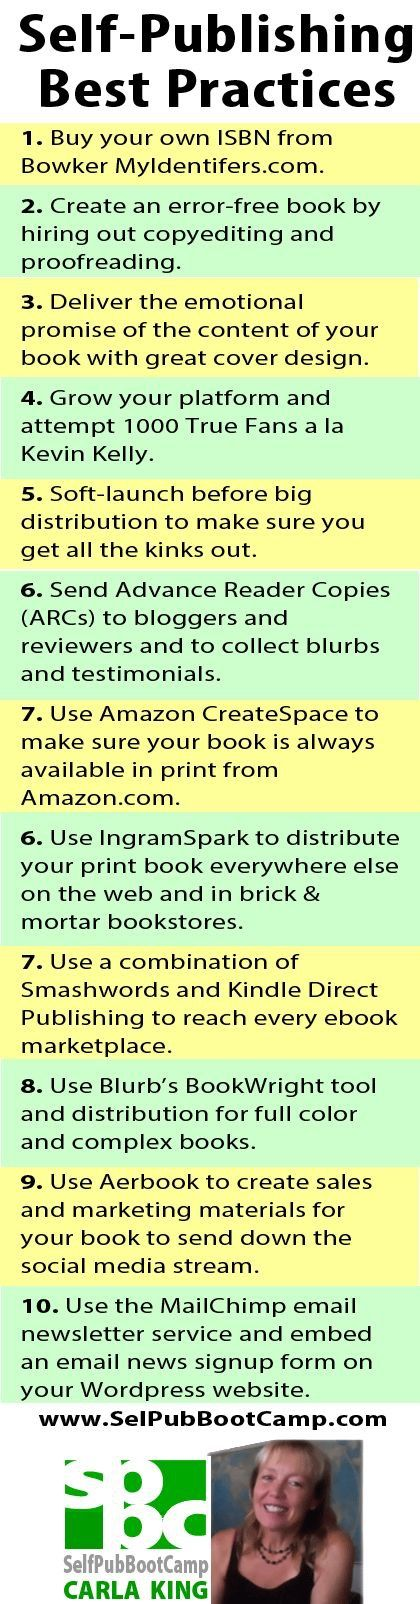 Self publishing best practices